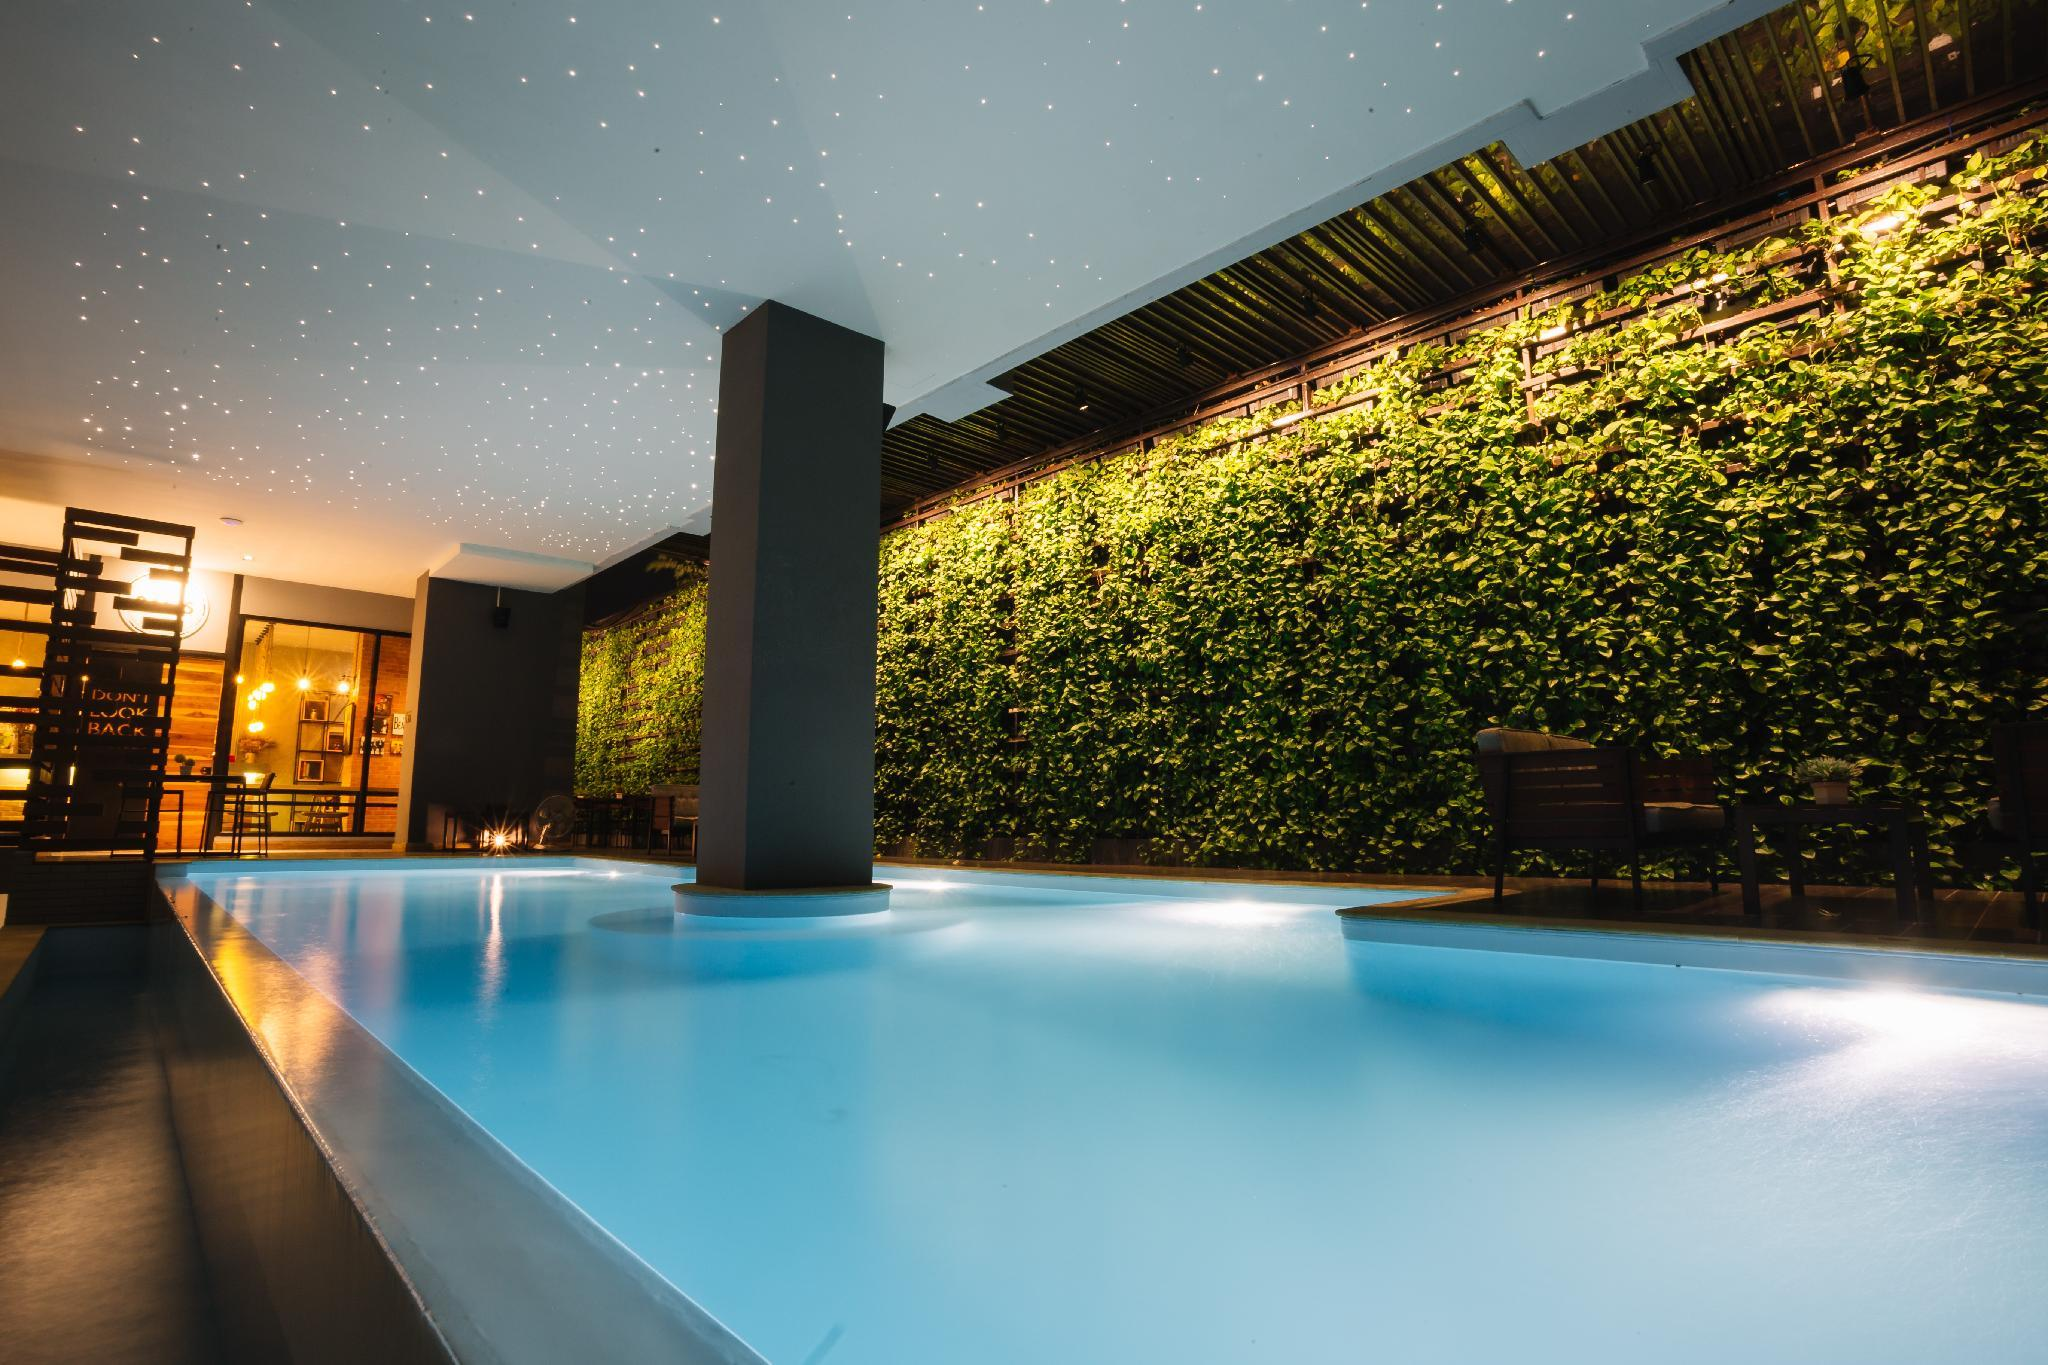 Nadee 10 Resort & Hotel Reviews